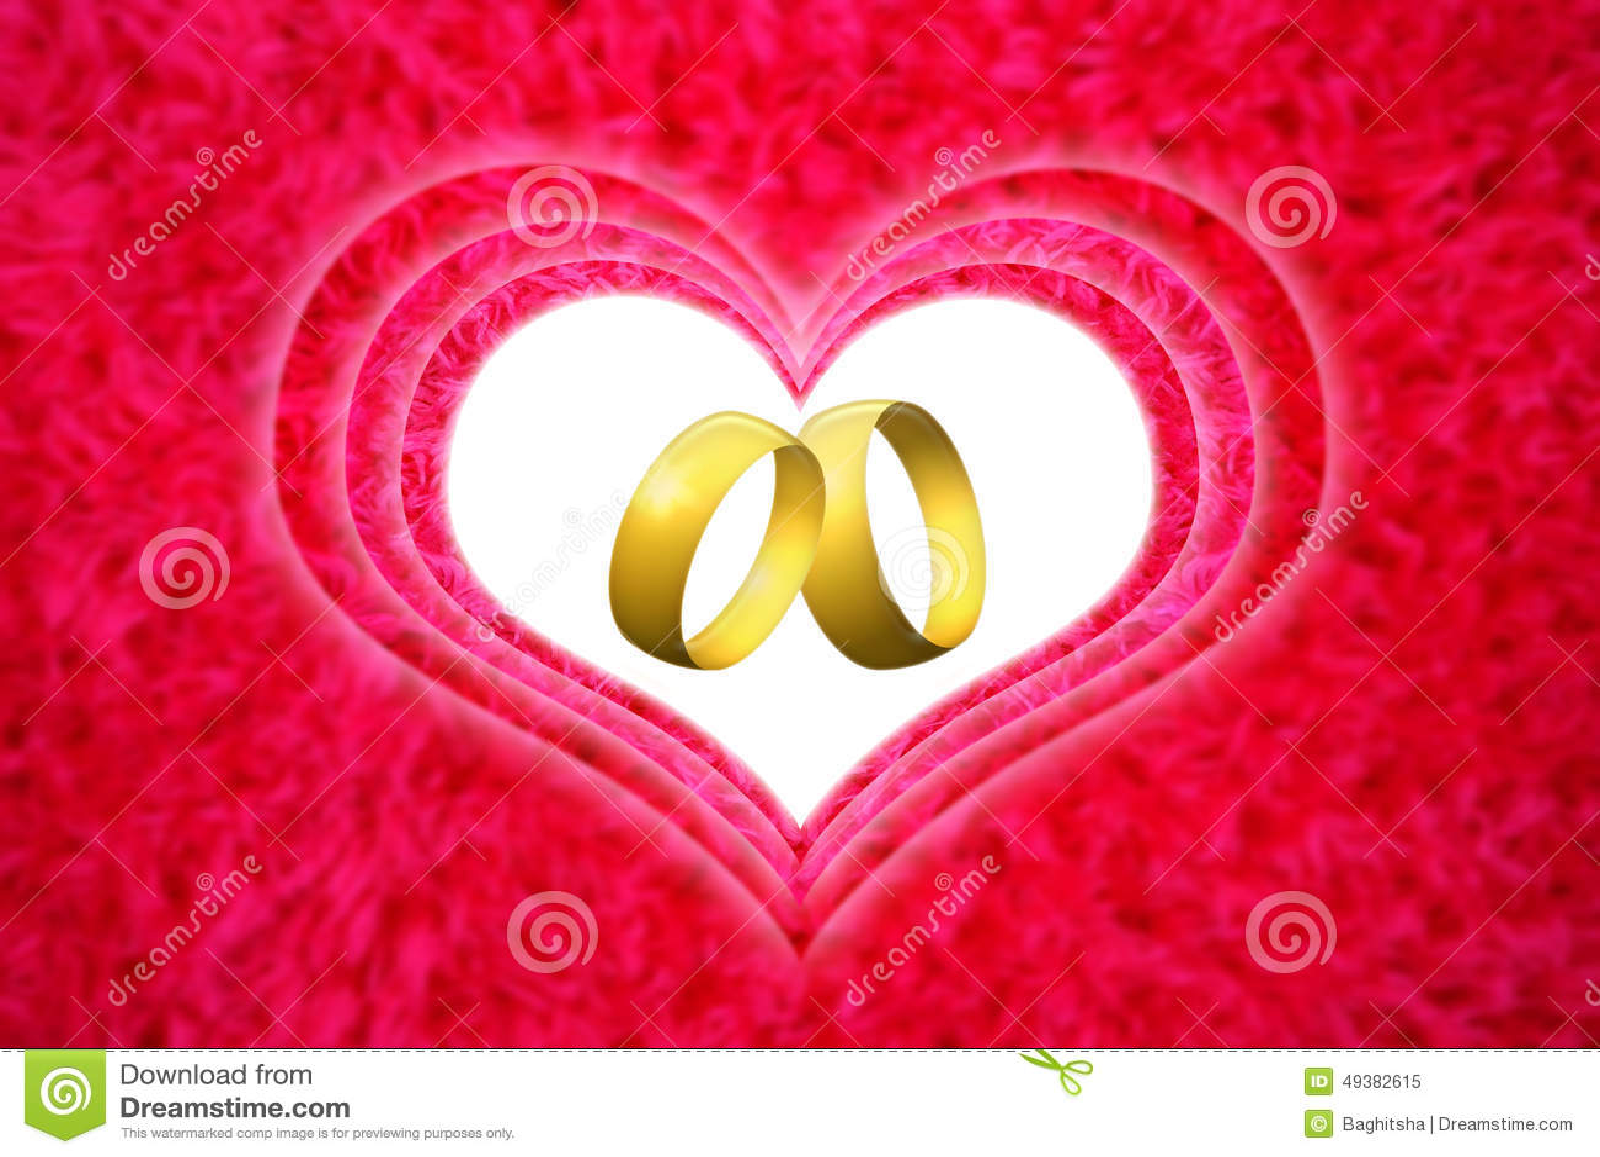 Compte rebours de mariage photo stock image 49382615 - Compte a rebours mariage ...